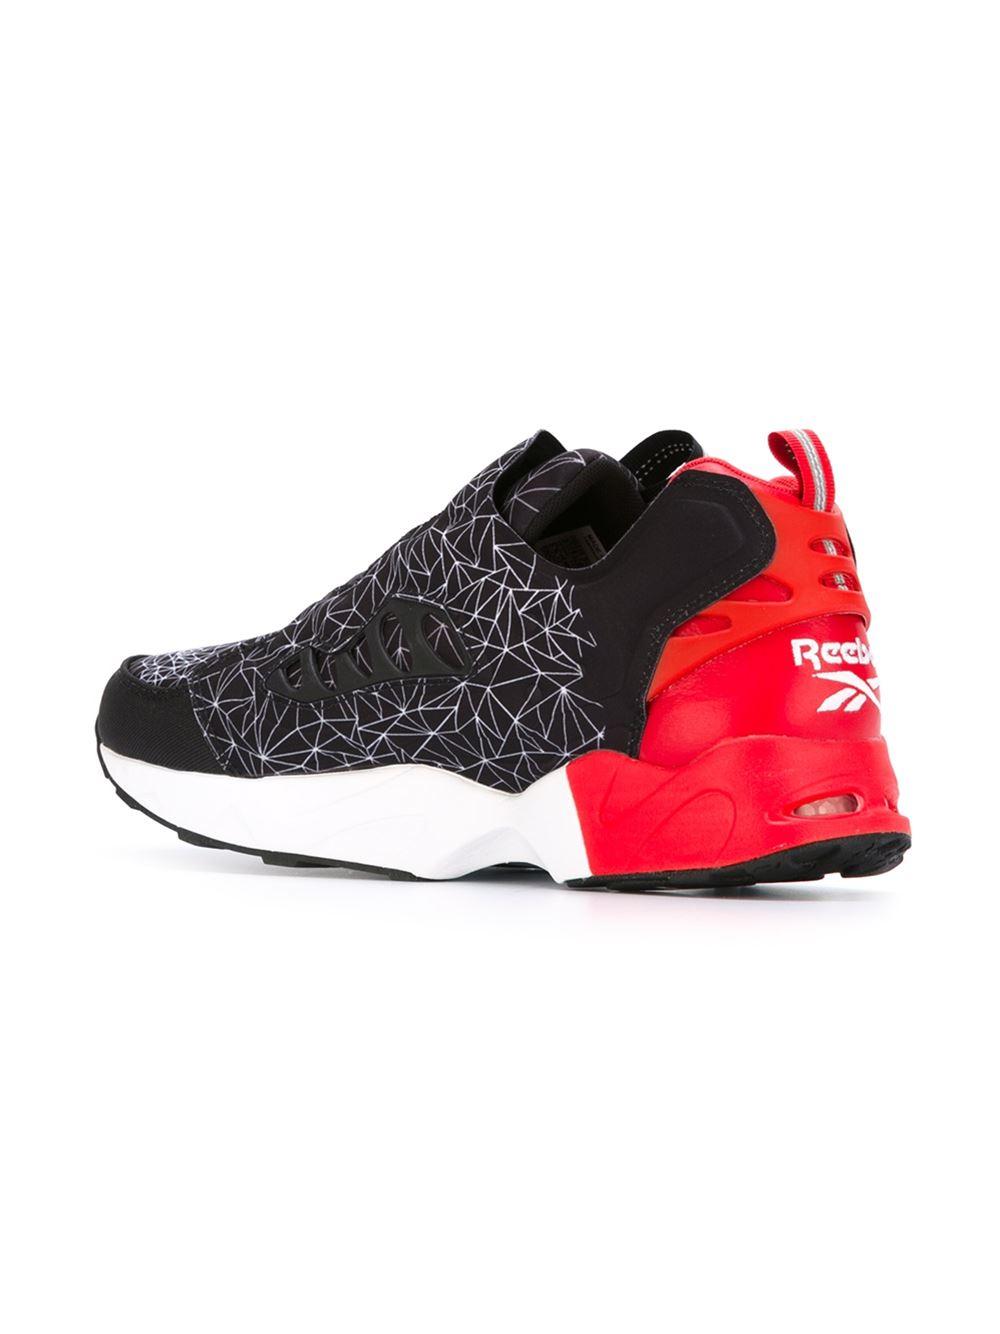 Reebok 'insta Pump Chinese New Year' Sneakers in Black